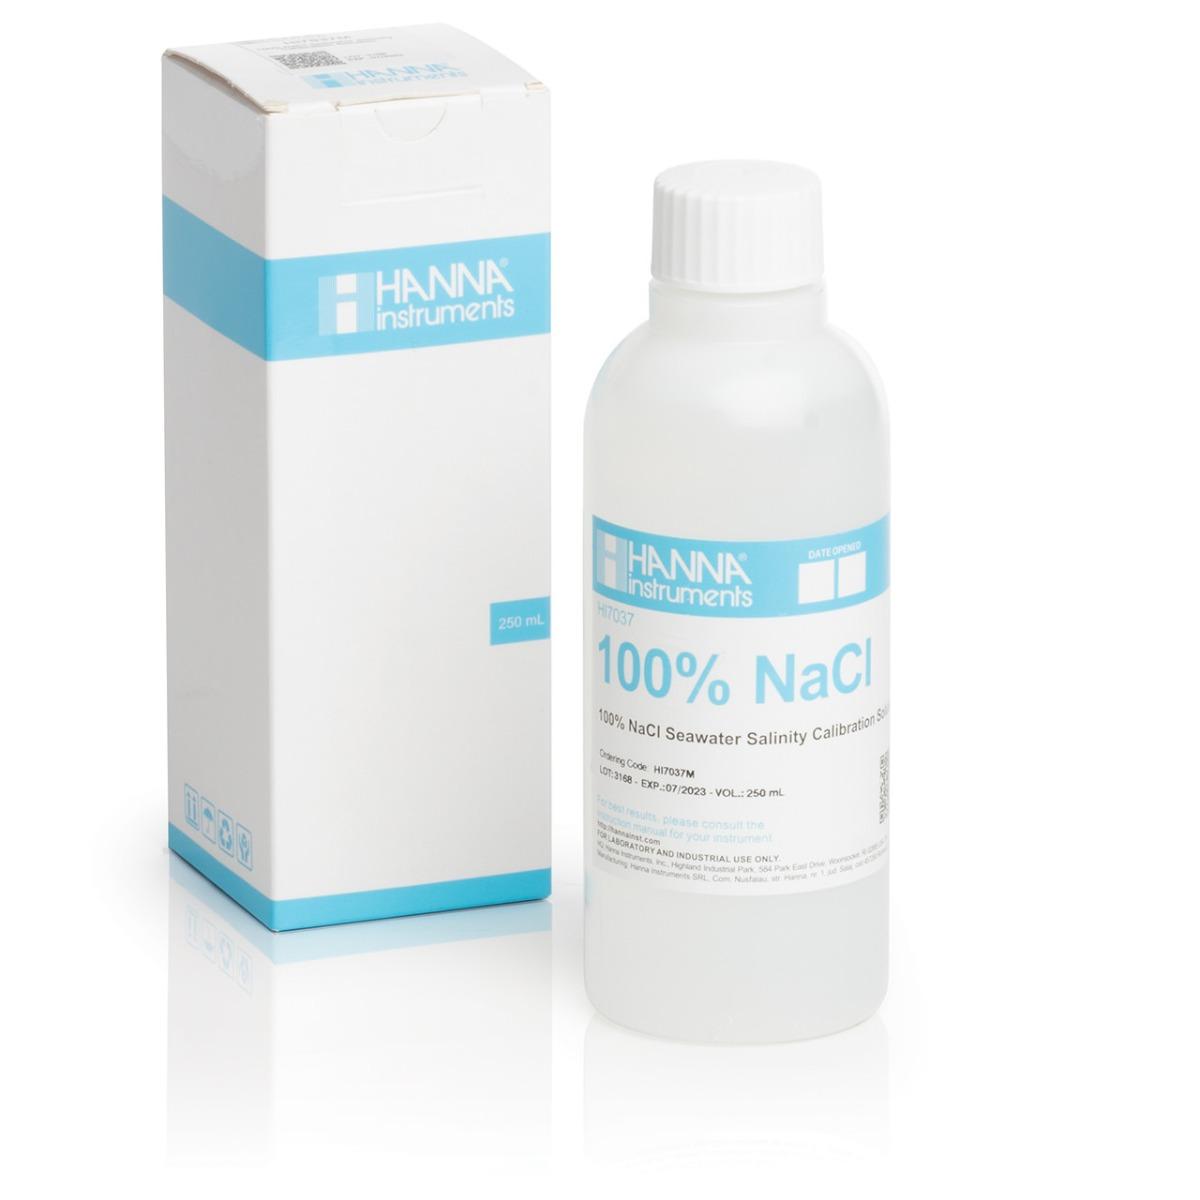 HI7037M Calibration solution for % Readings (100% NaCl) (230 mL) bottle